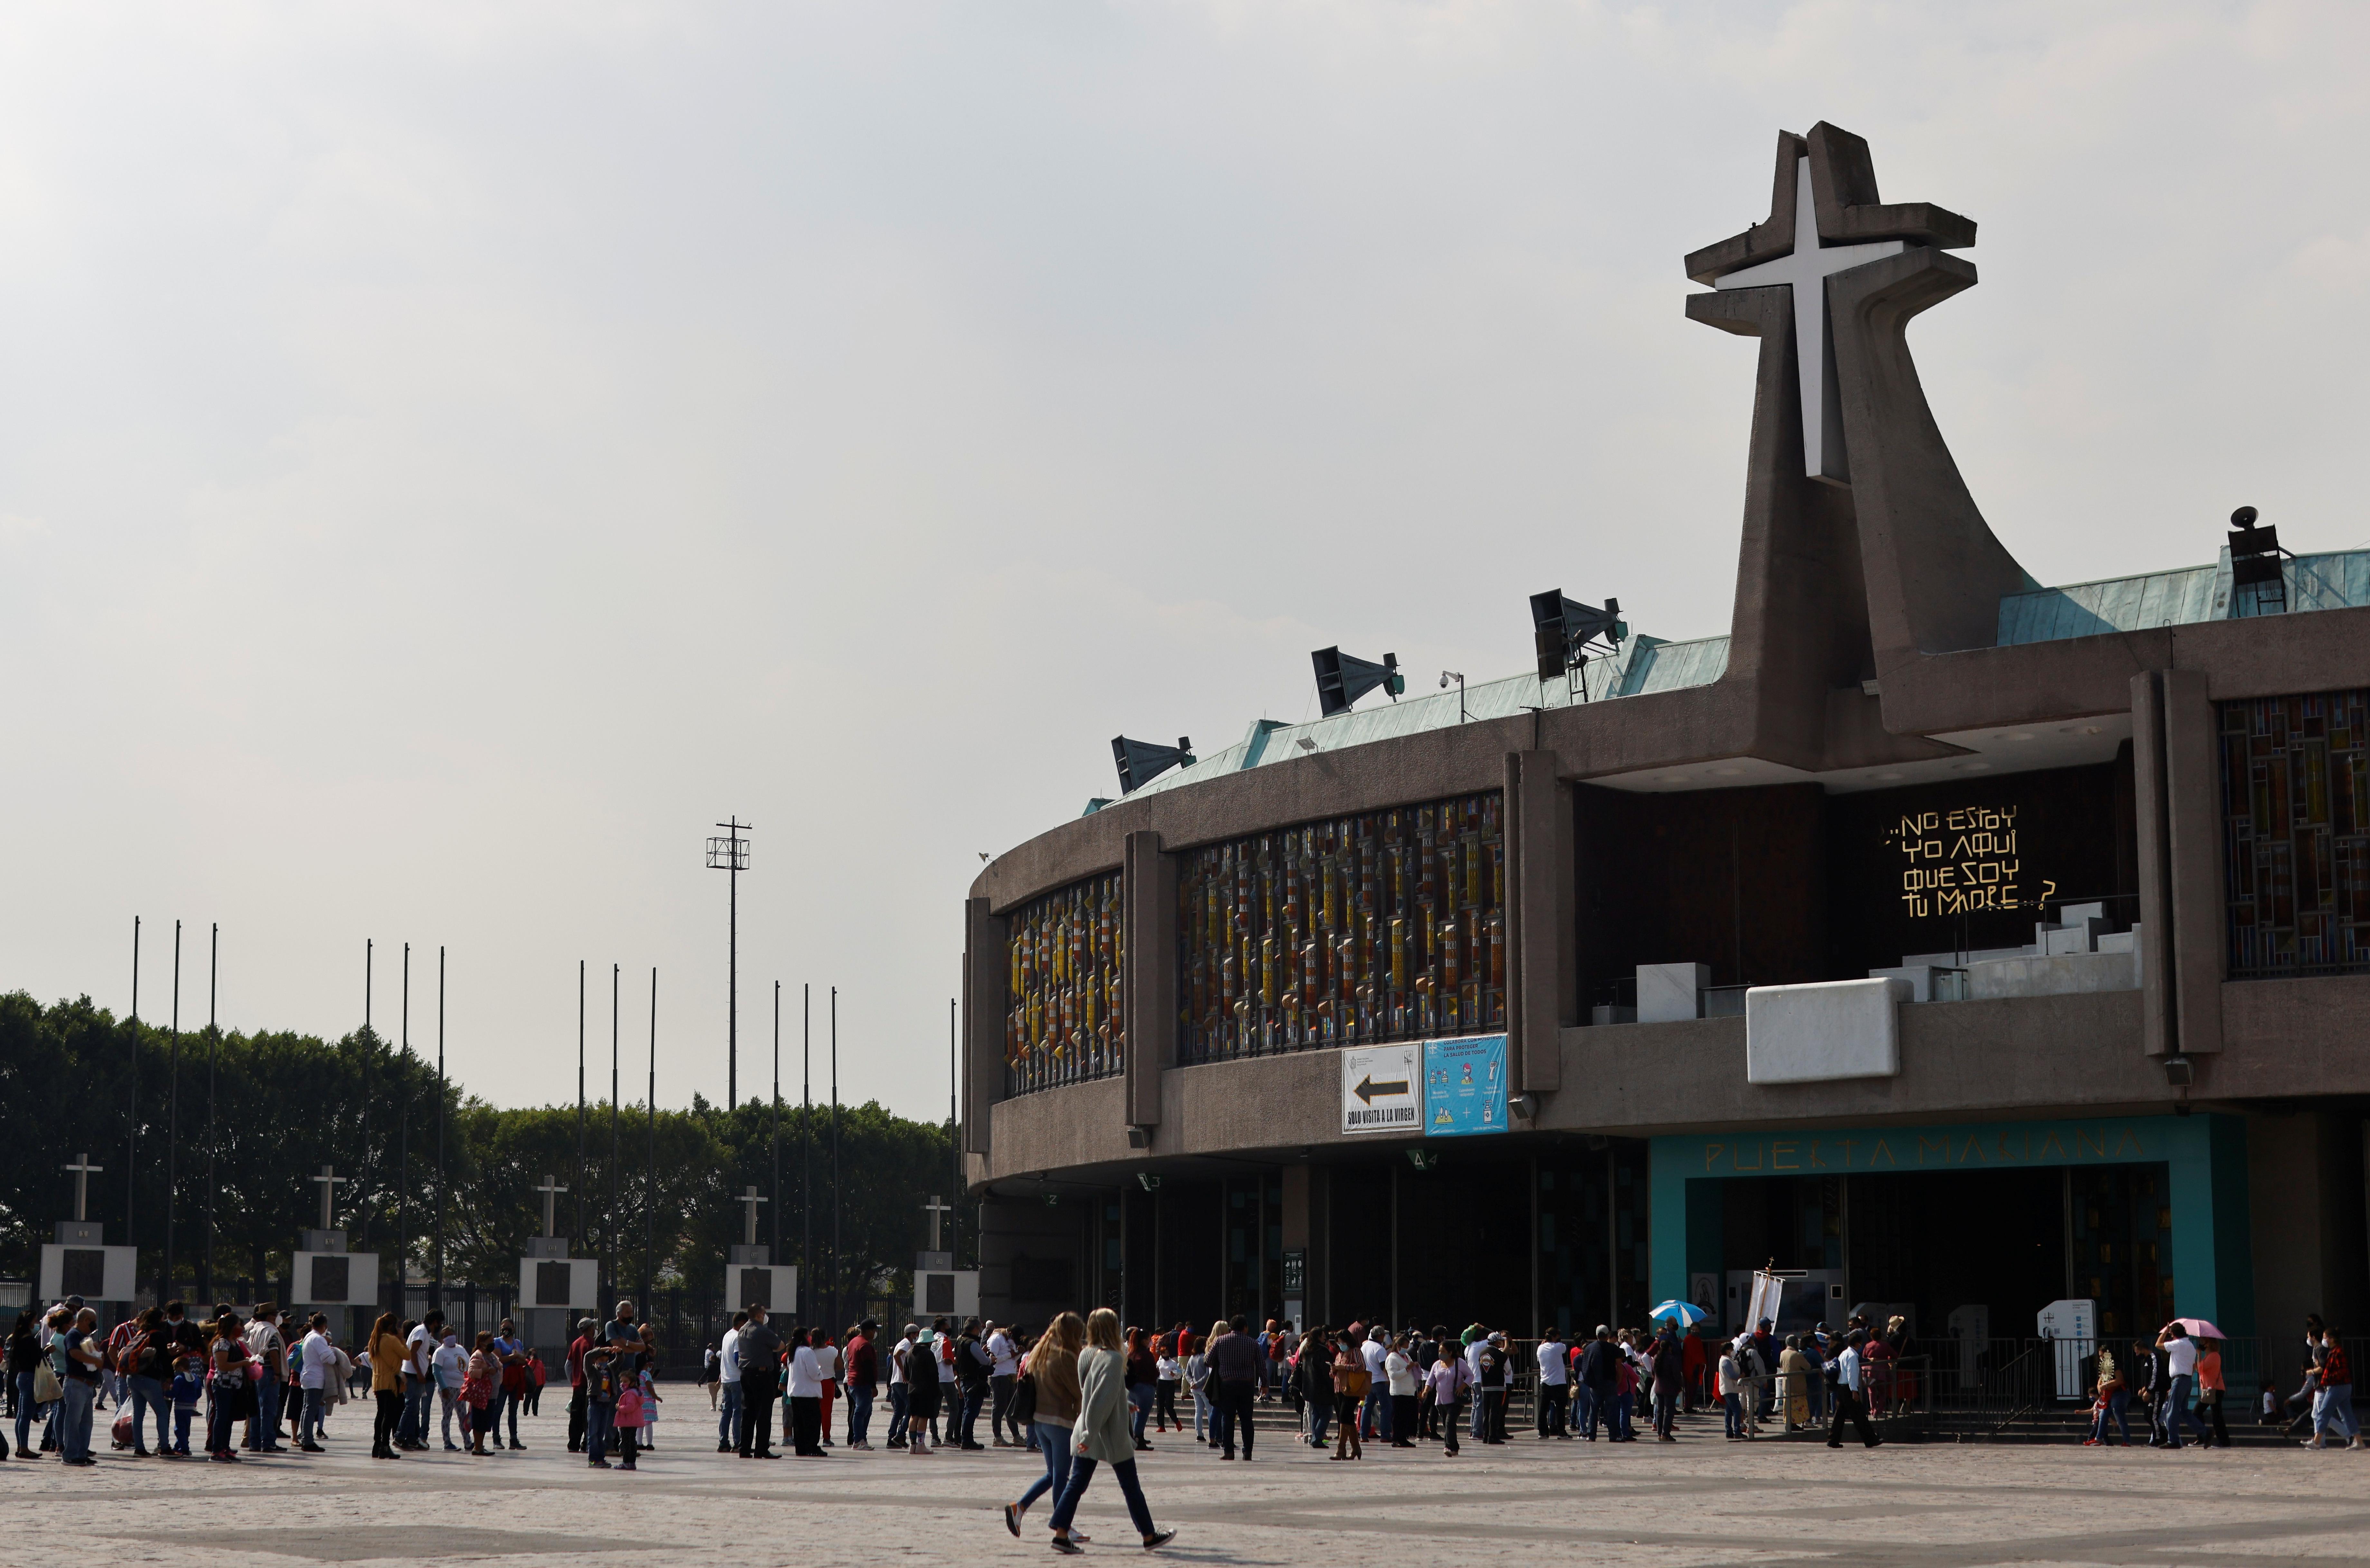 Ciudad de México, México 8 de diciembre de 2020.